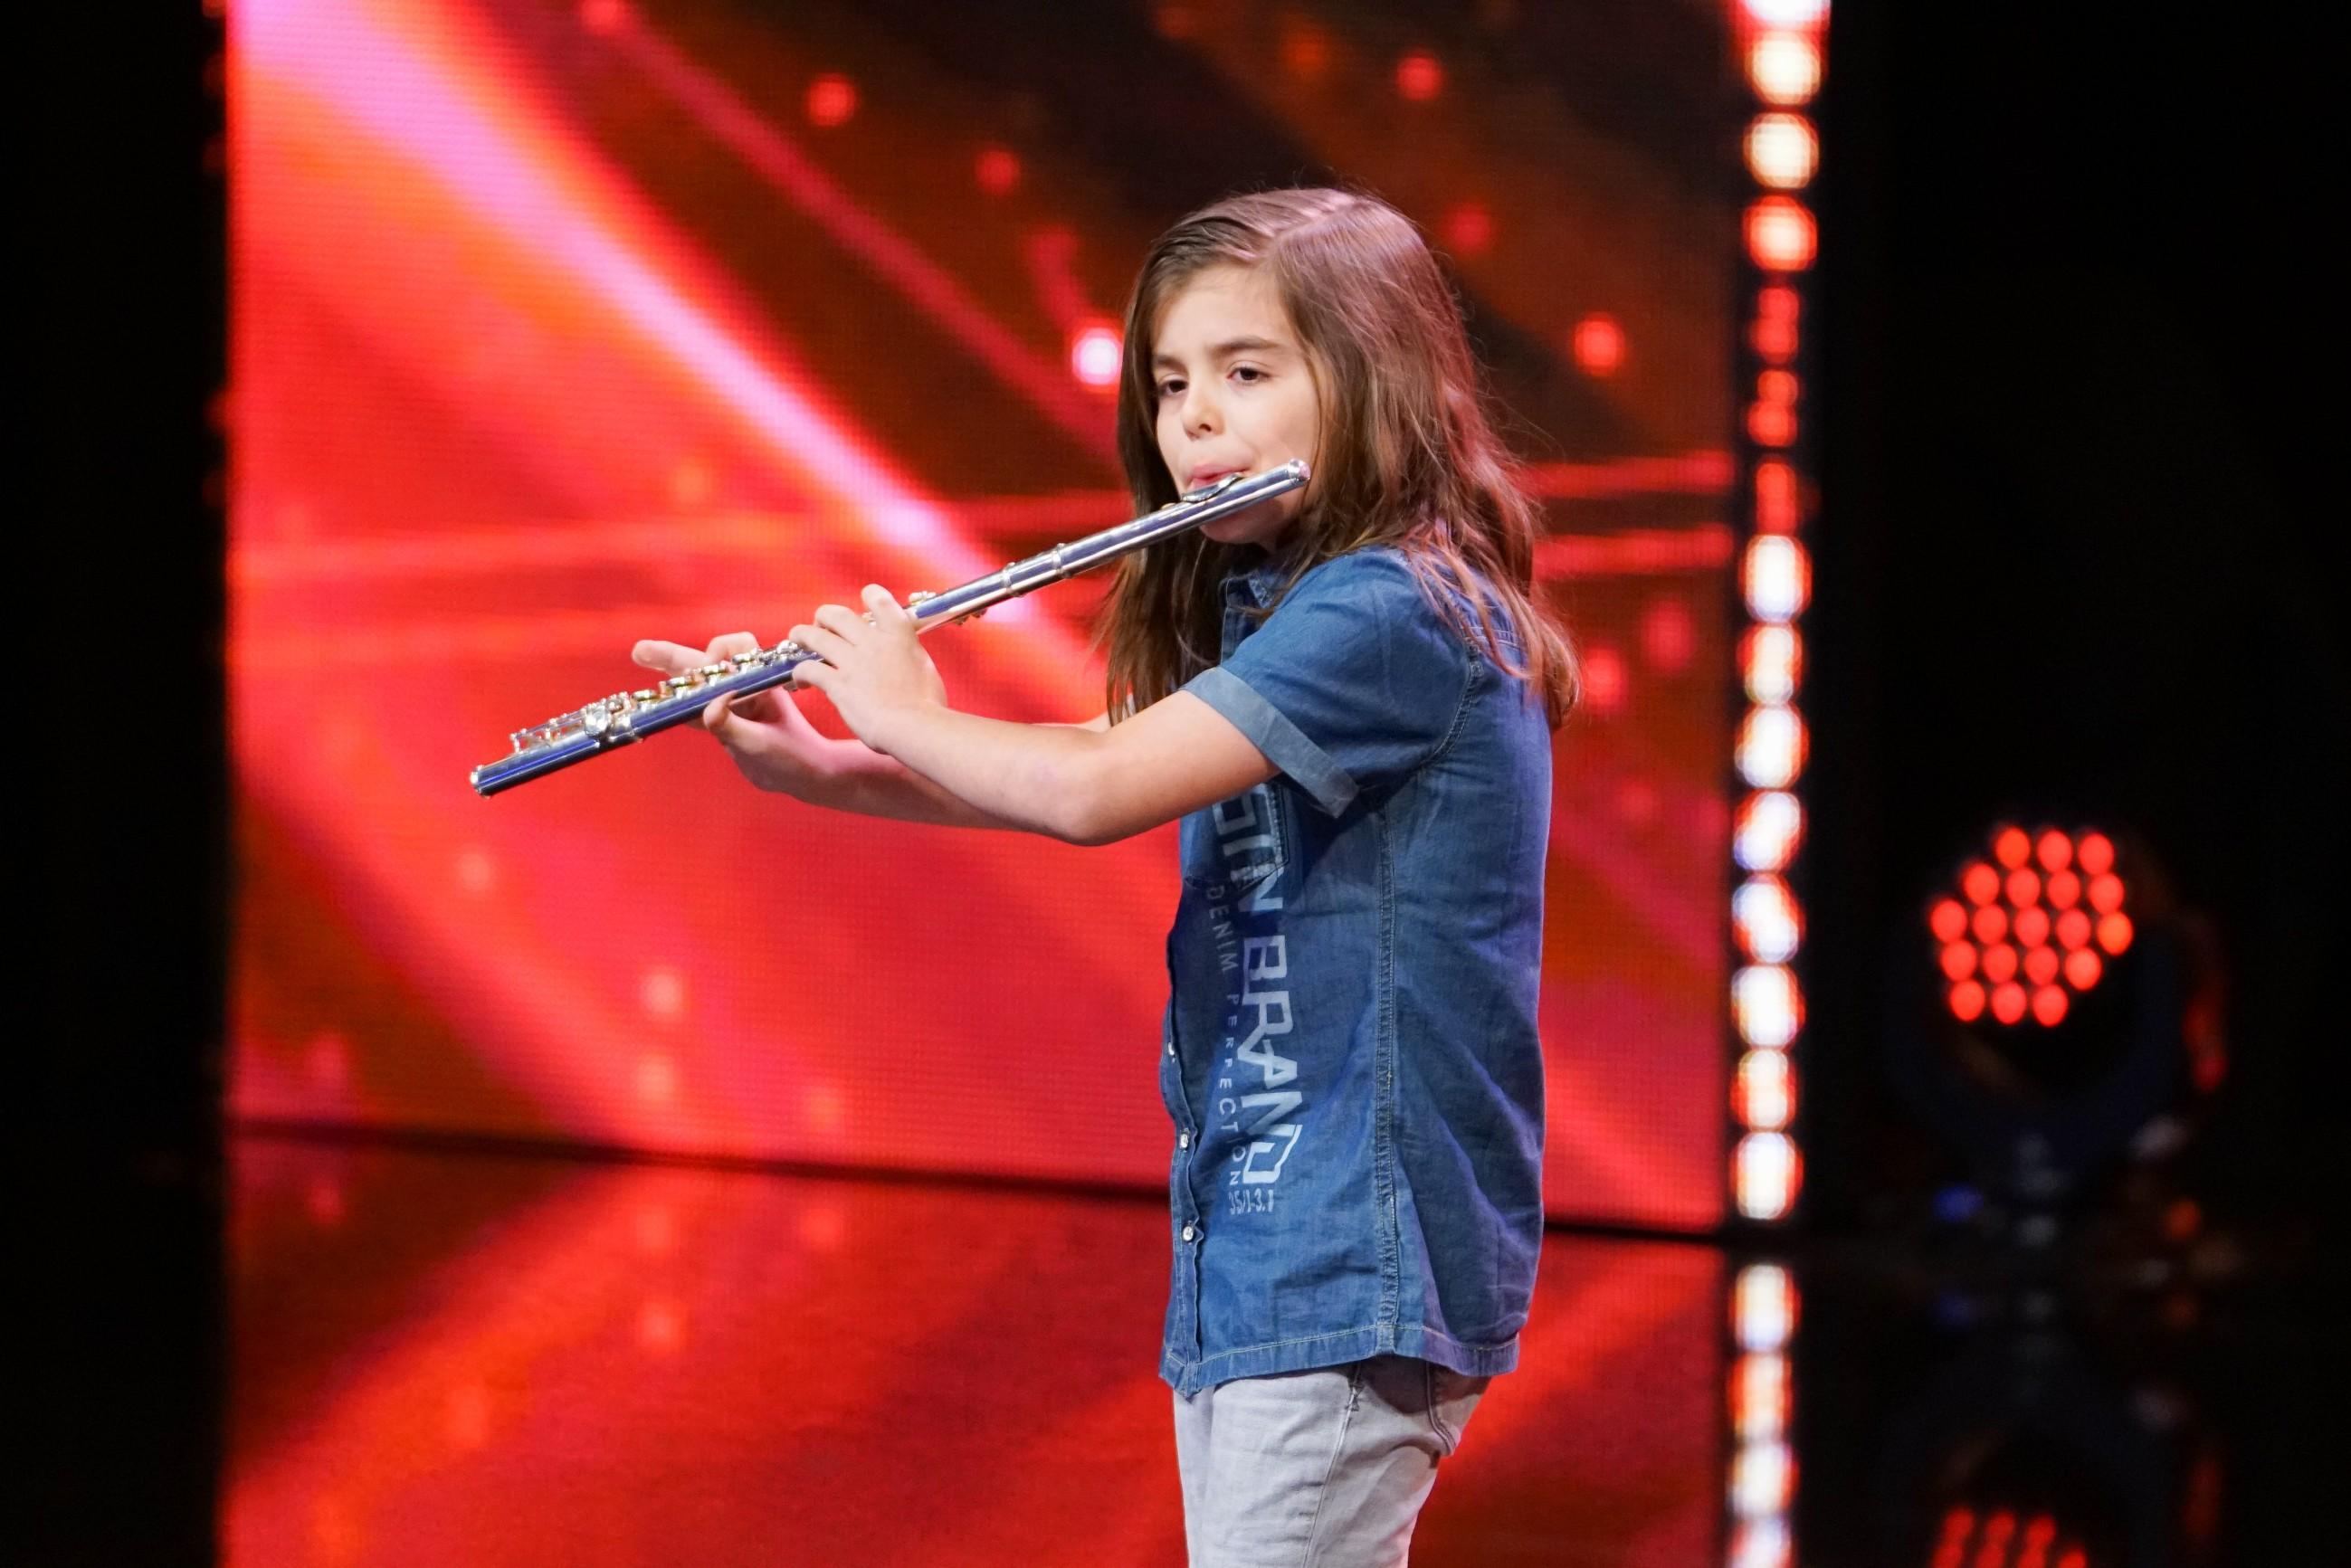 Das Supertalent 2017 Show 6 - Noel Lehar